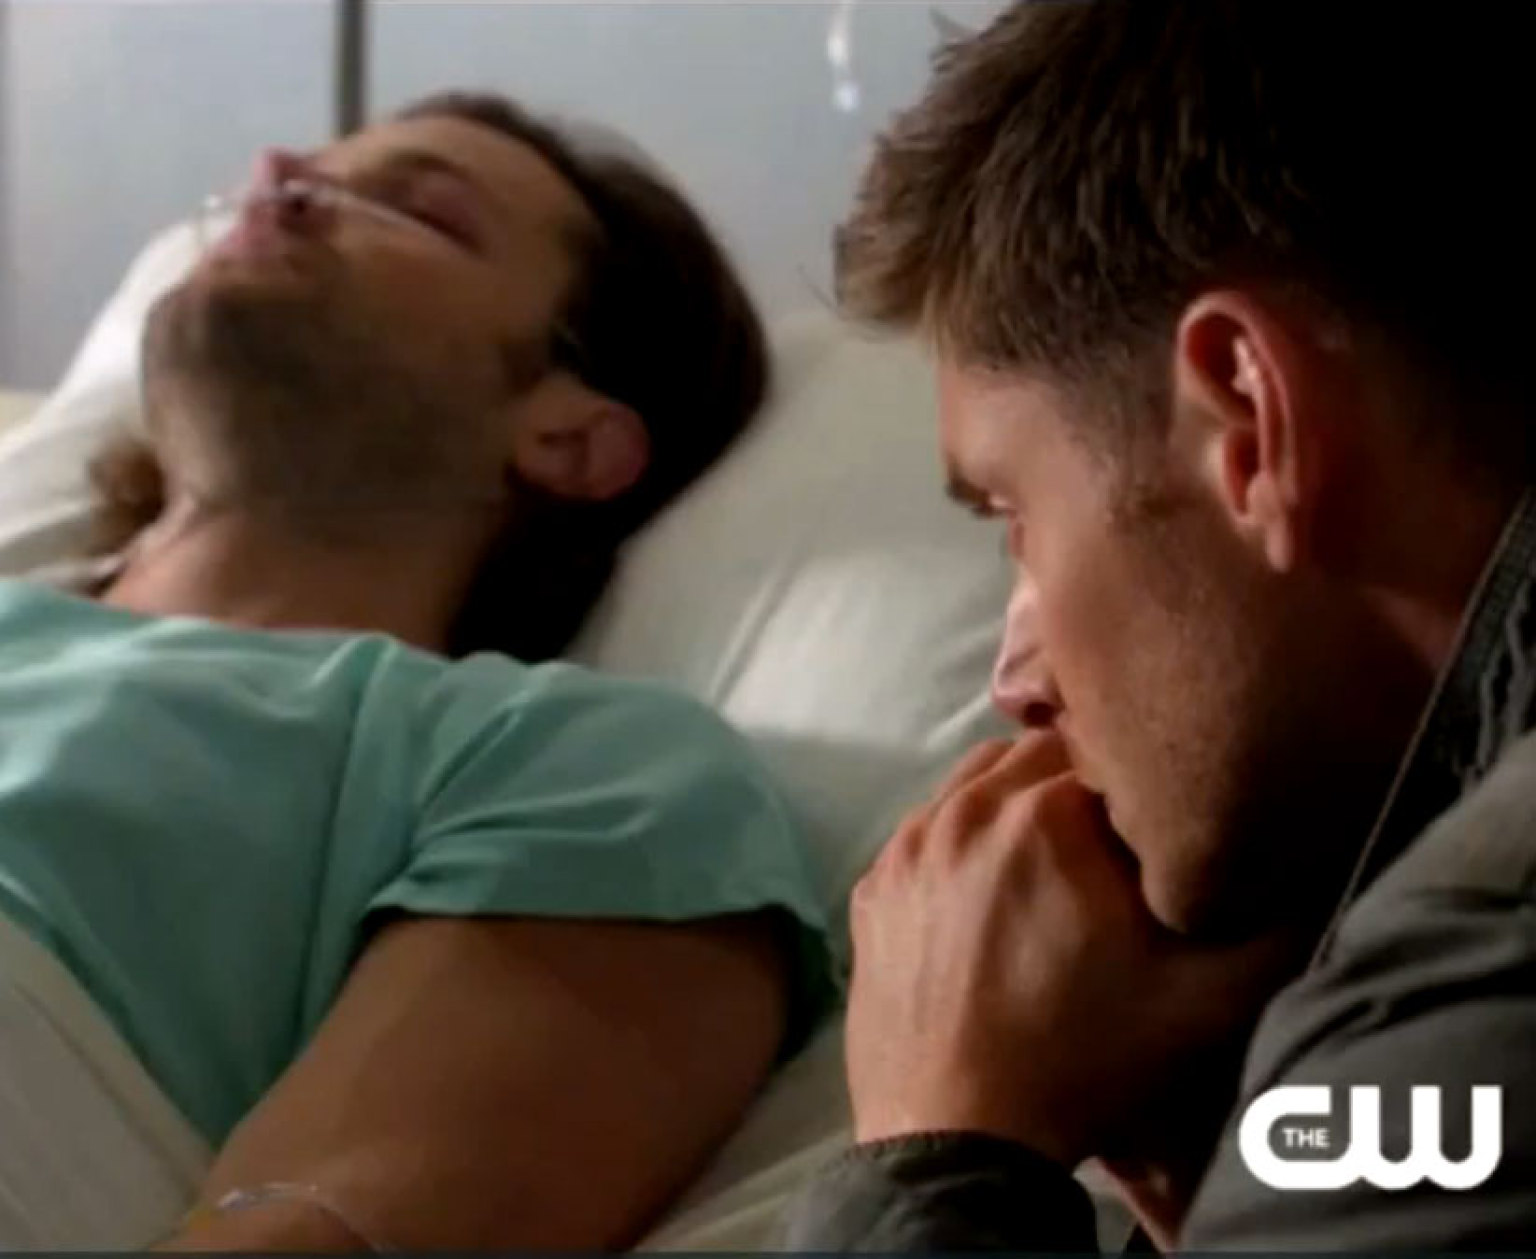 when does the new supernatural episodes starto SUPERNATURAL SEASON 9 4tb5OV9d